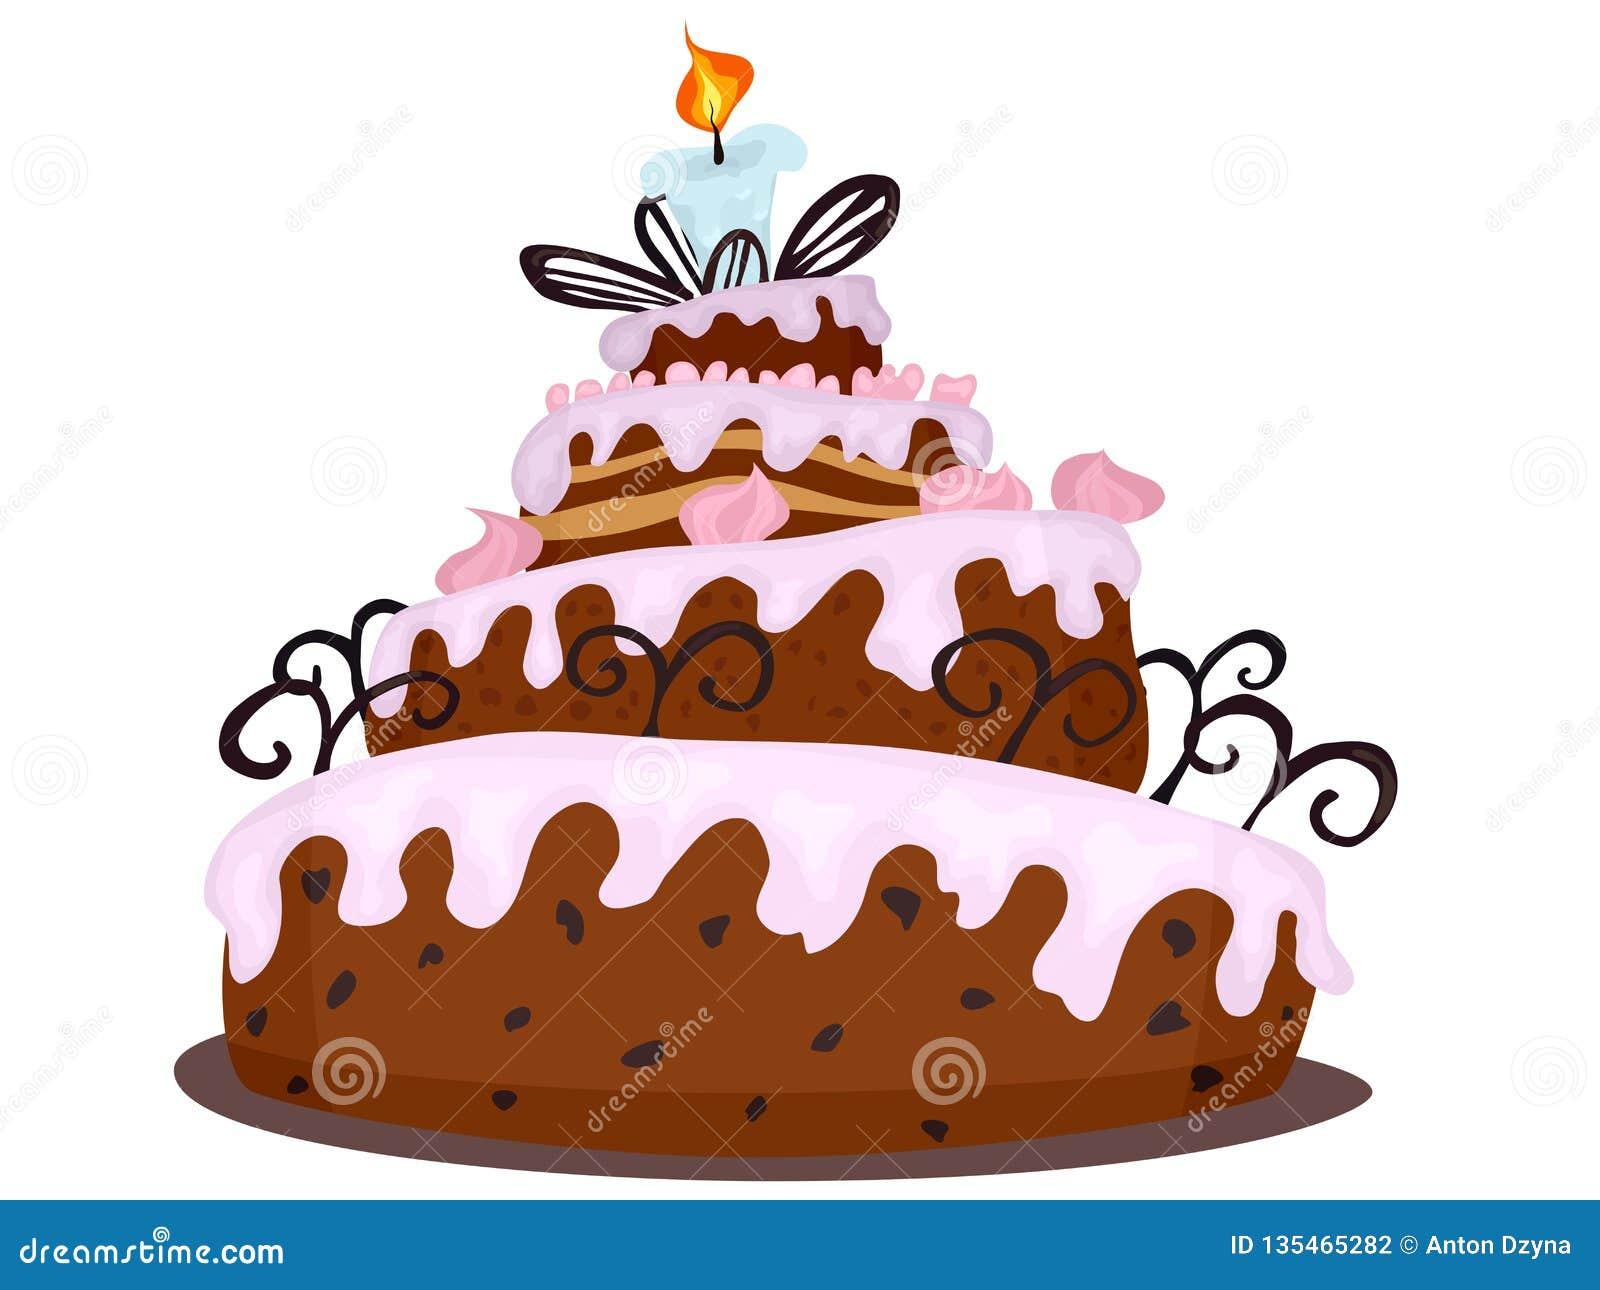 Outstanding Big Chocolate Cake With Cream Drawing Cartoon Stock Illustration Personalised Birthday Cards Veneteletsinfo